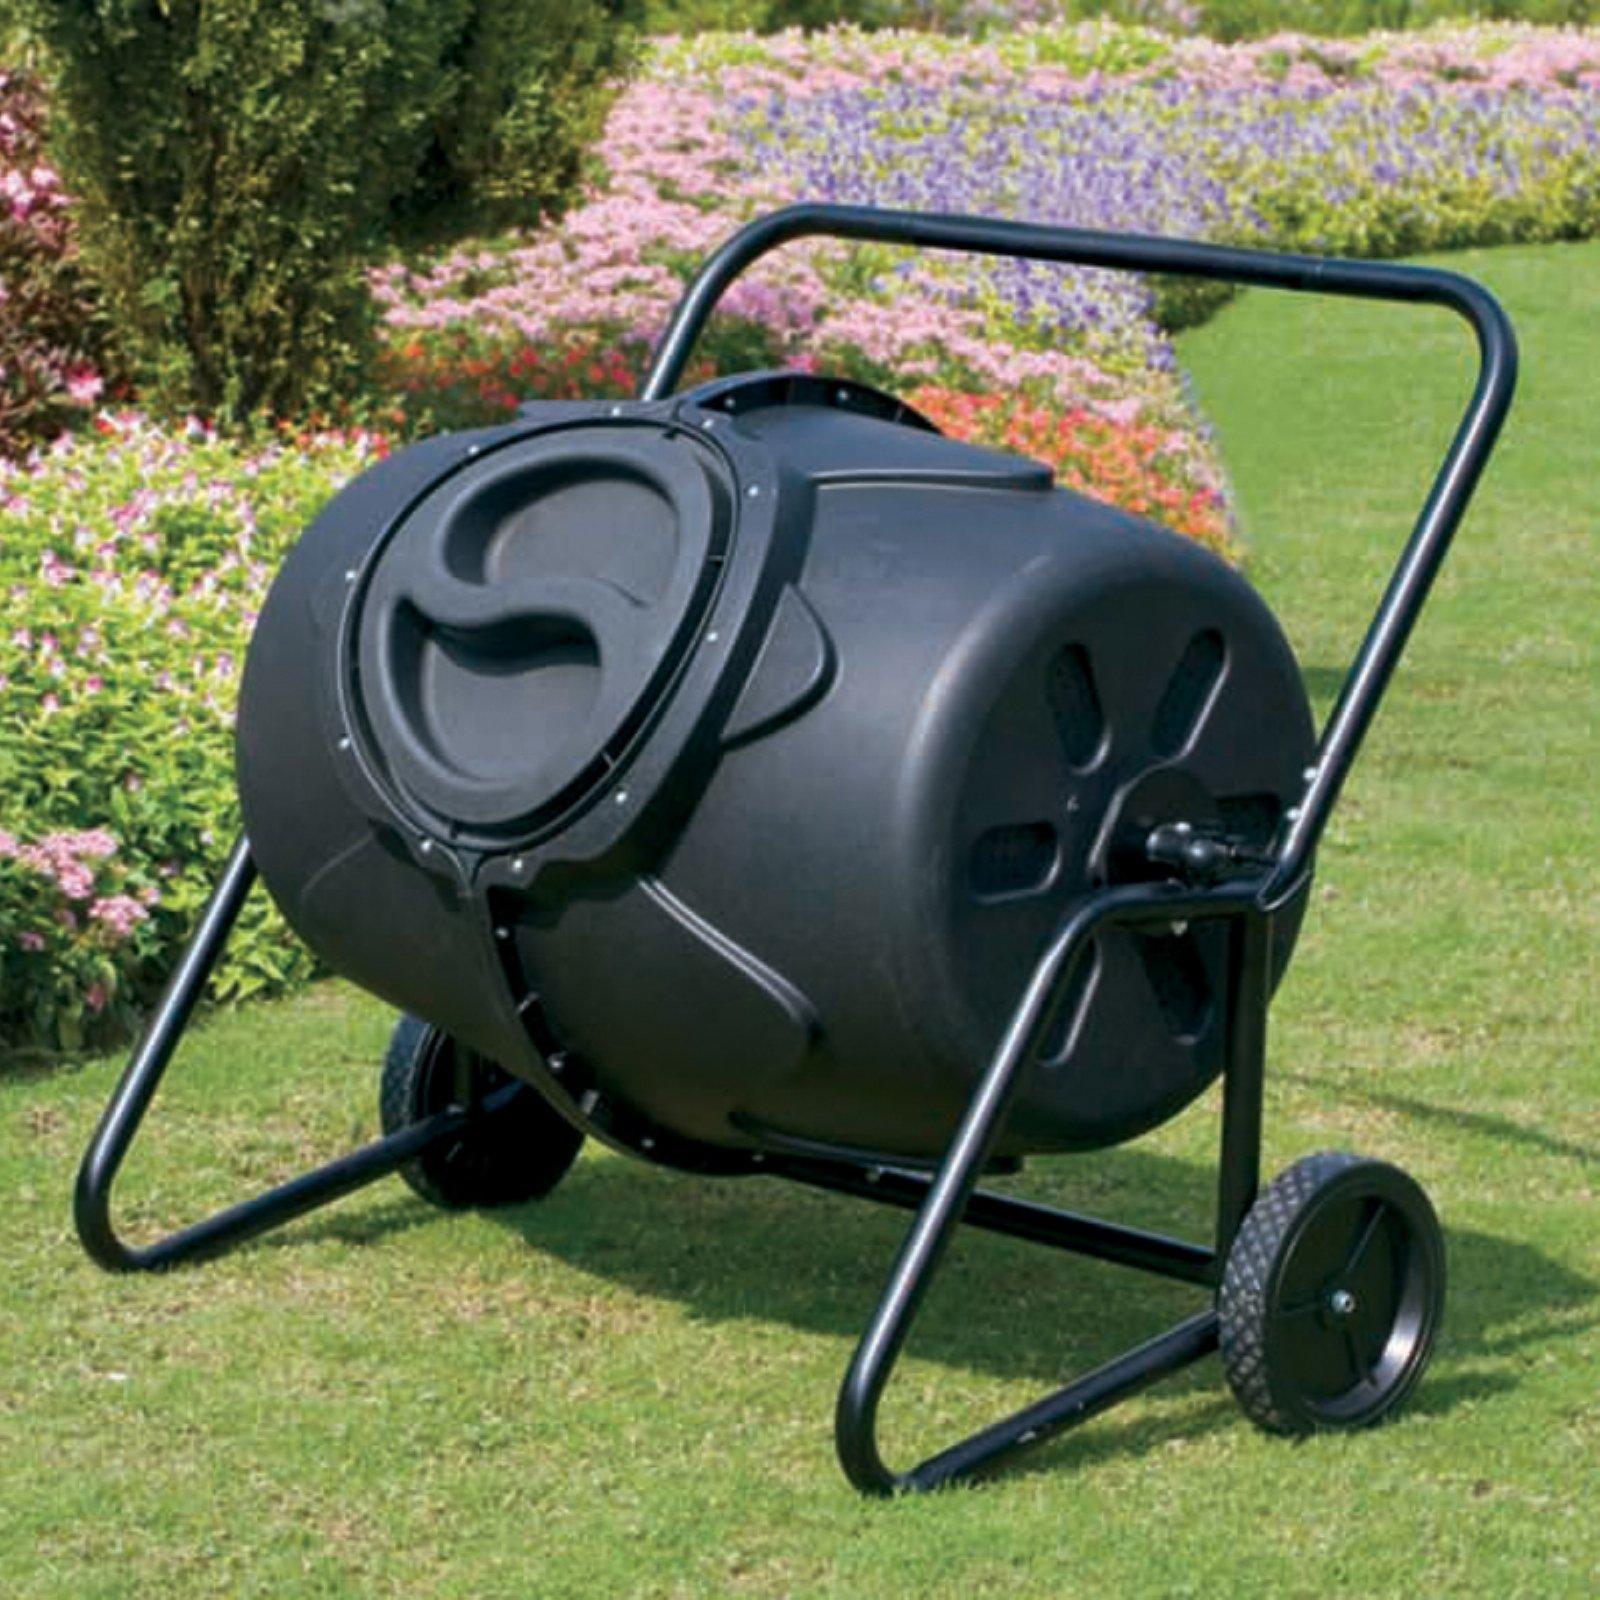 Koolscape 50 gal HD Wheeled Tumbling Composter